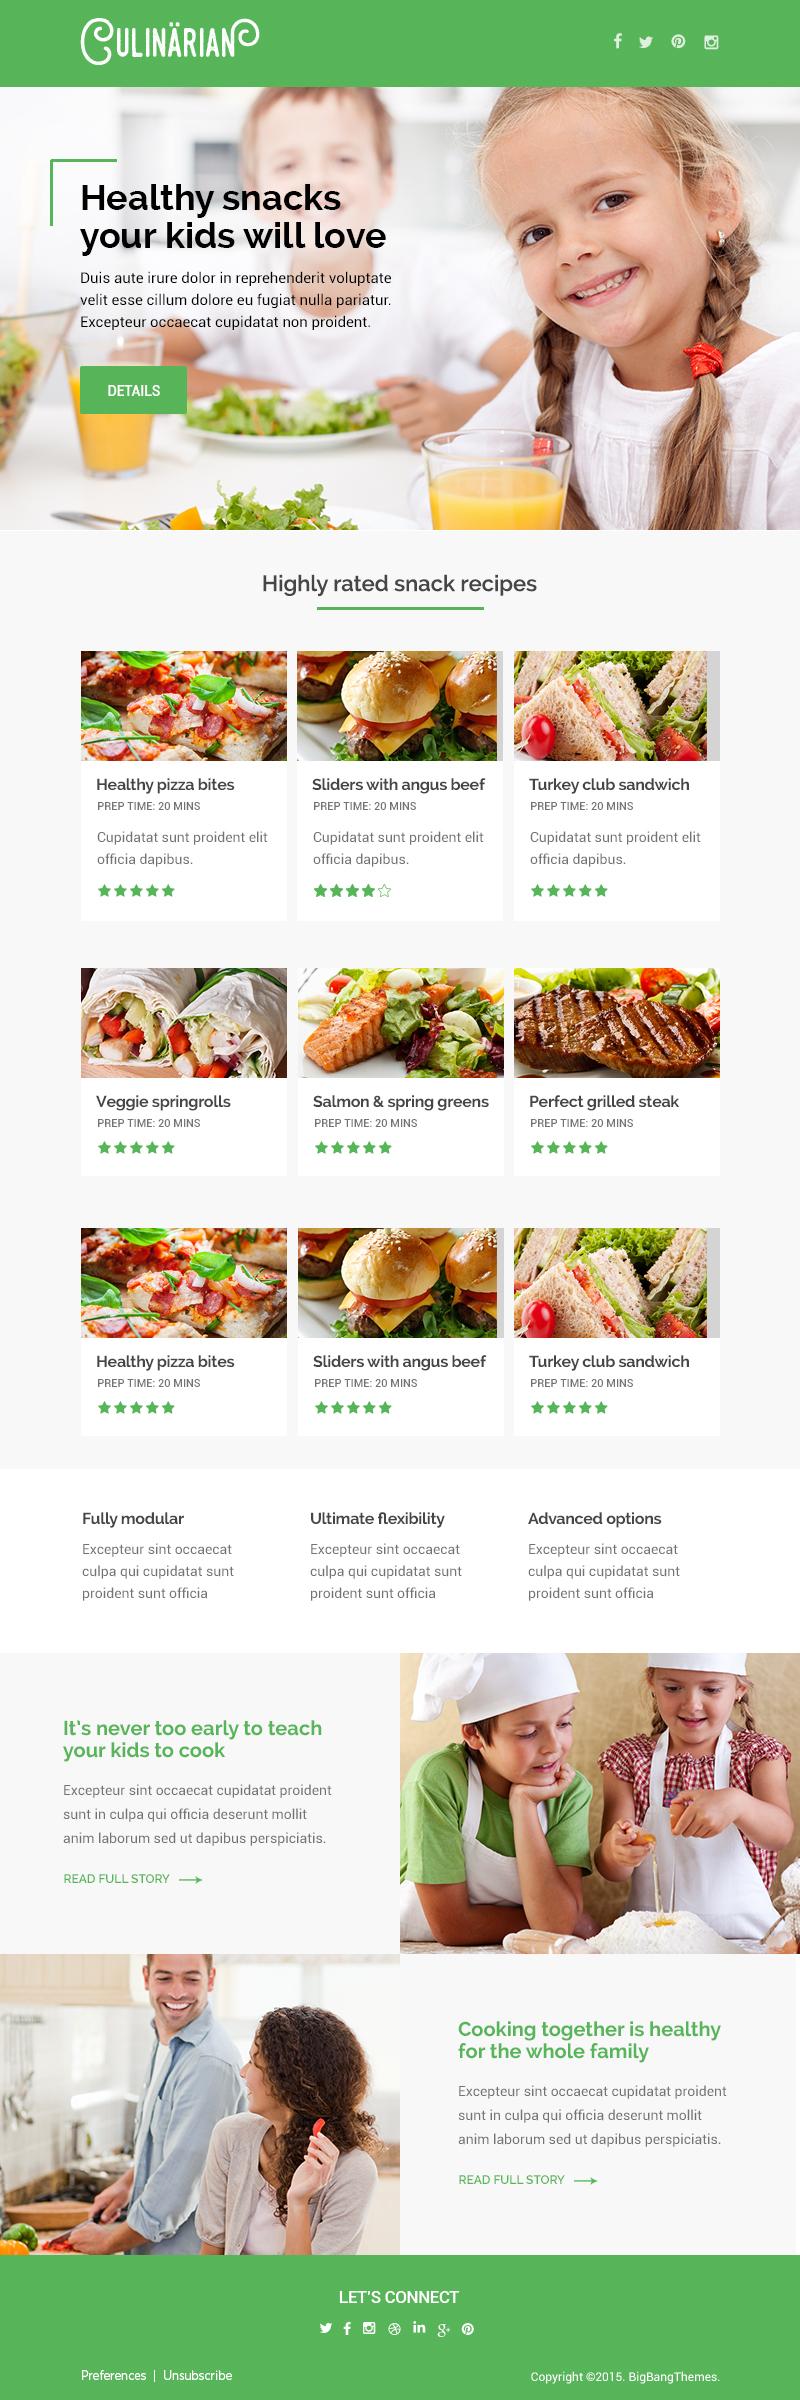 Culinarian - Multipurpose Restaurant Email + Builder Access